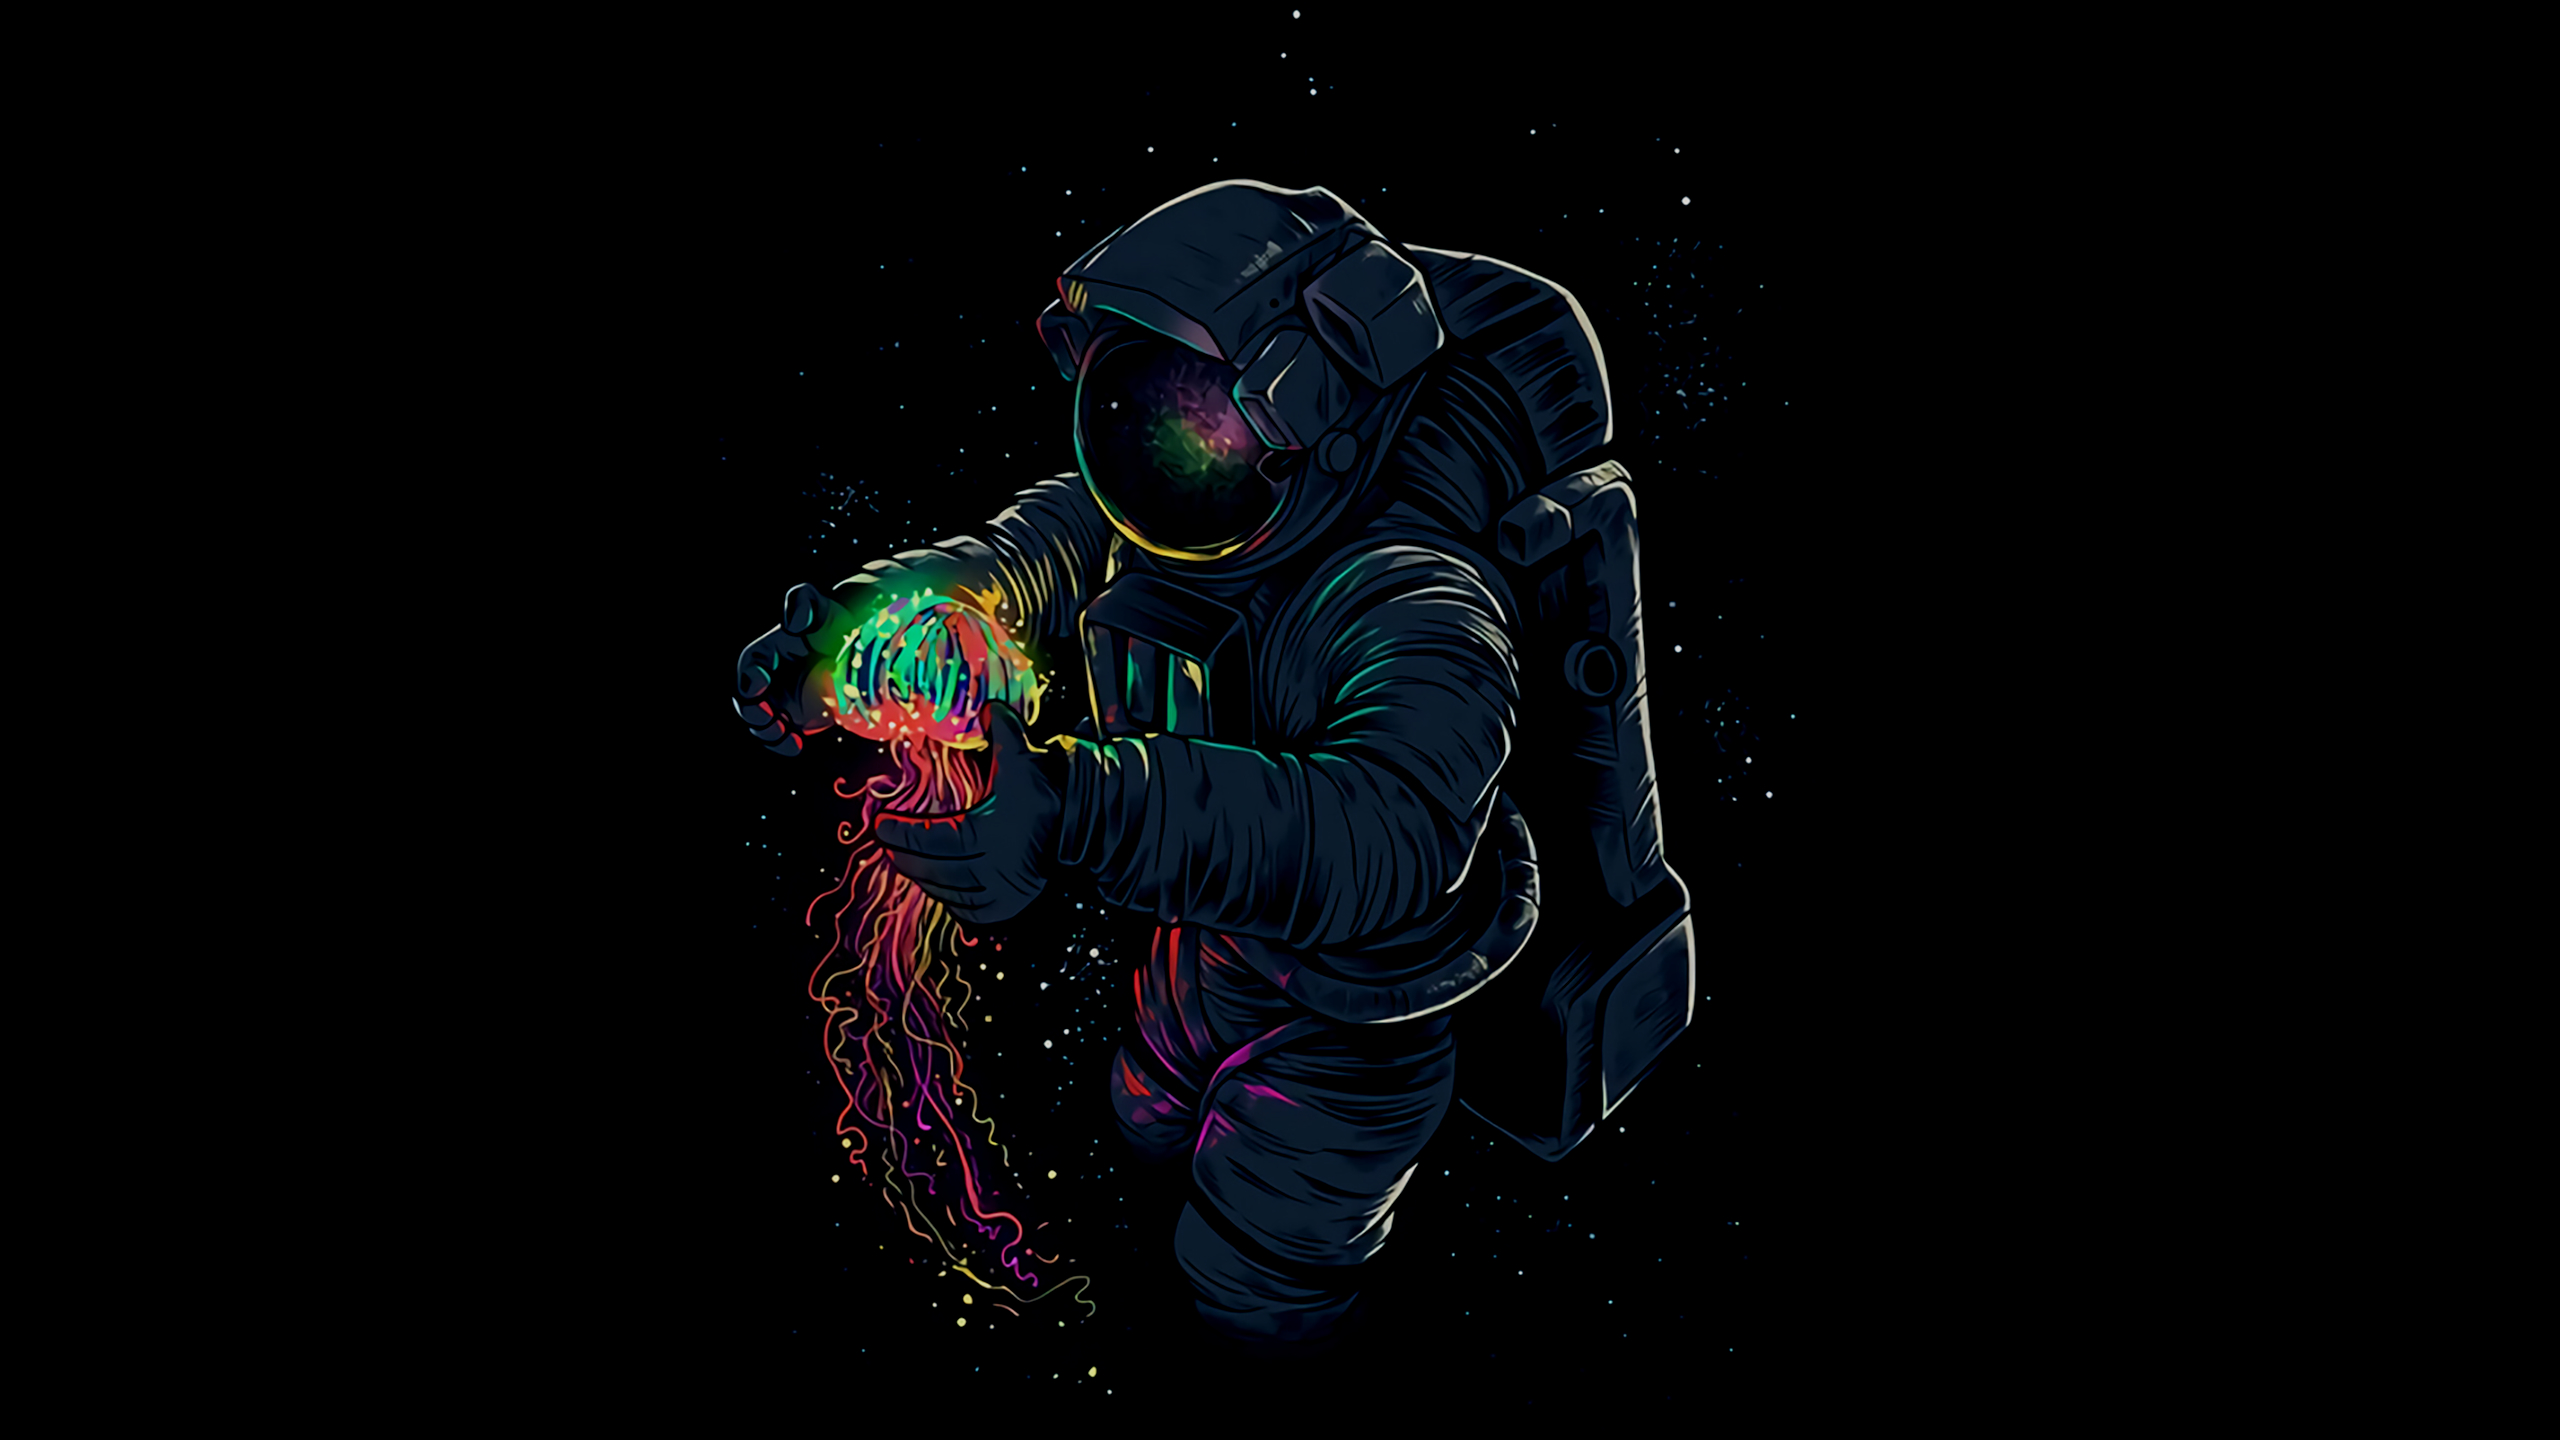 Astronaut with jellyfish wallpaper hd artist 4k for Sfondi 2560x1440